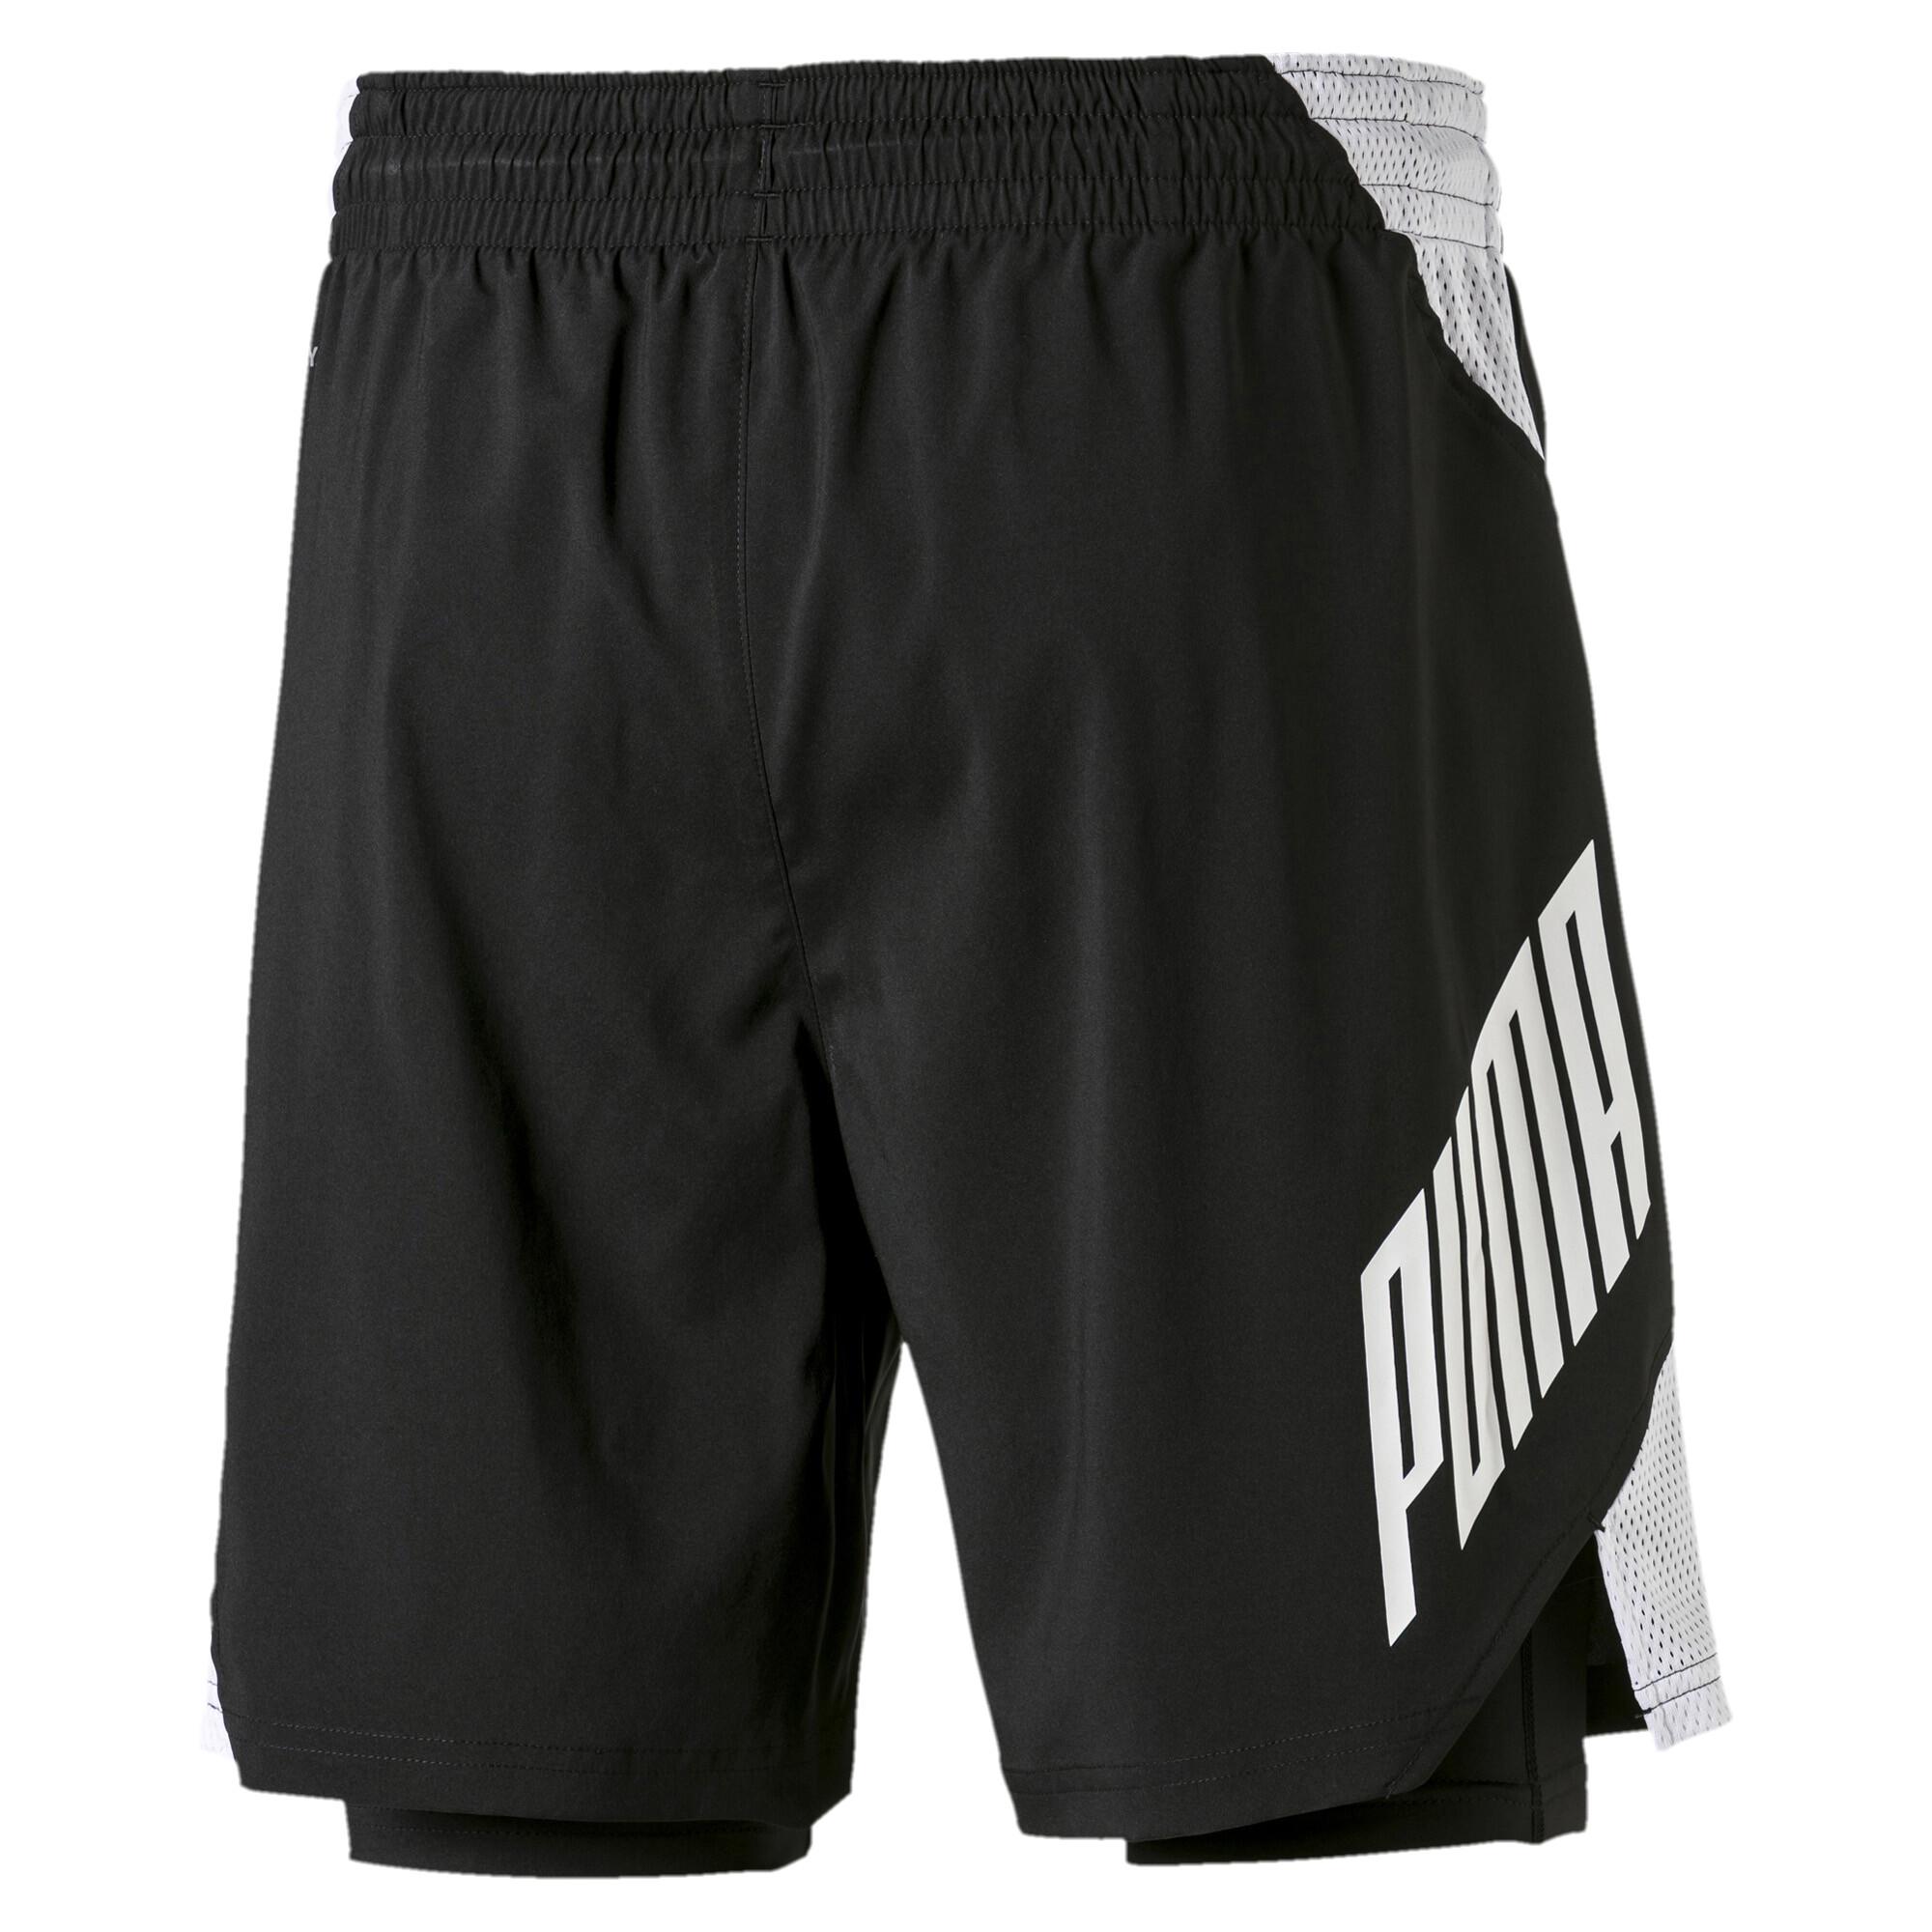 Image Puma A.C.E. Woven 2 in 1 Men's Training Shorts #3